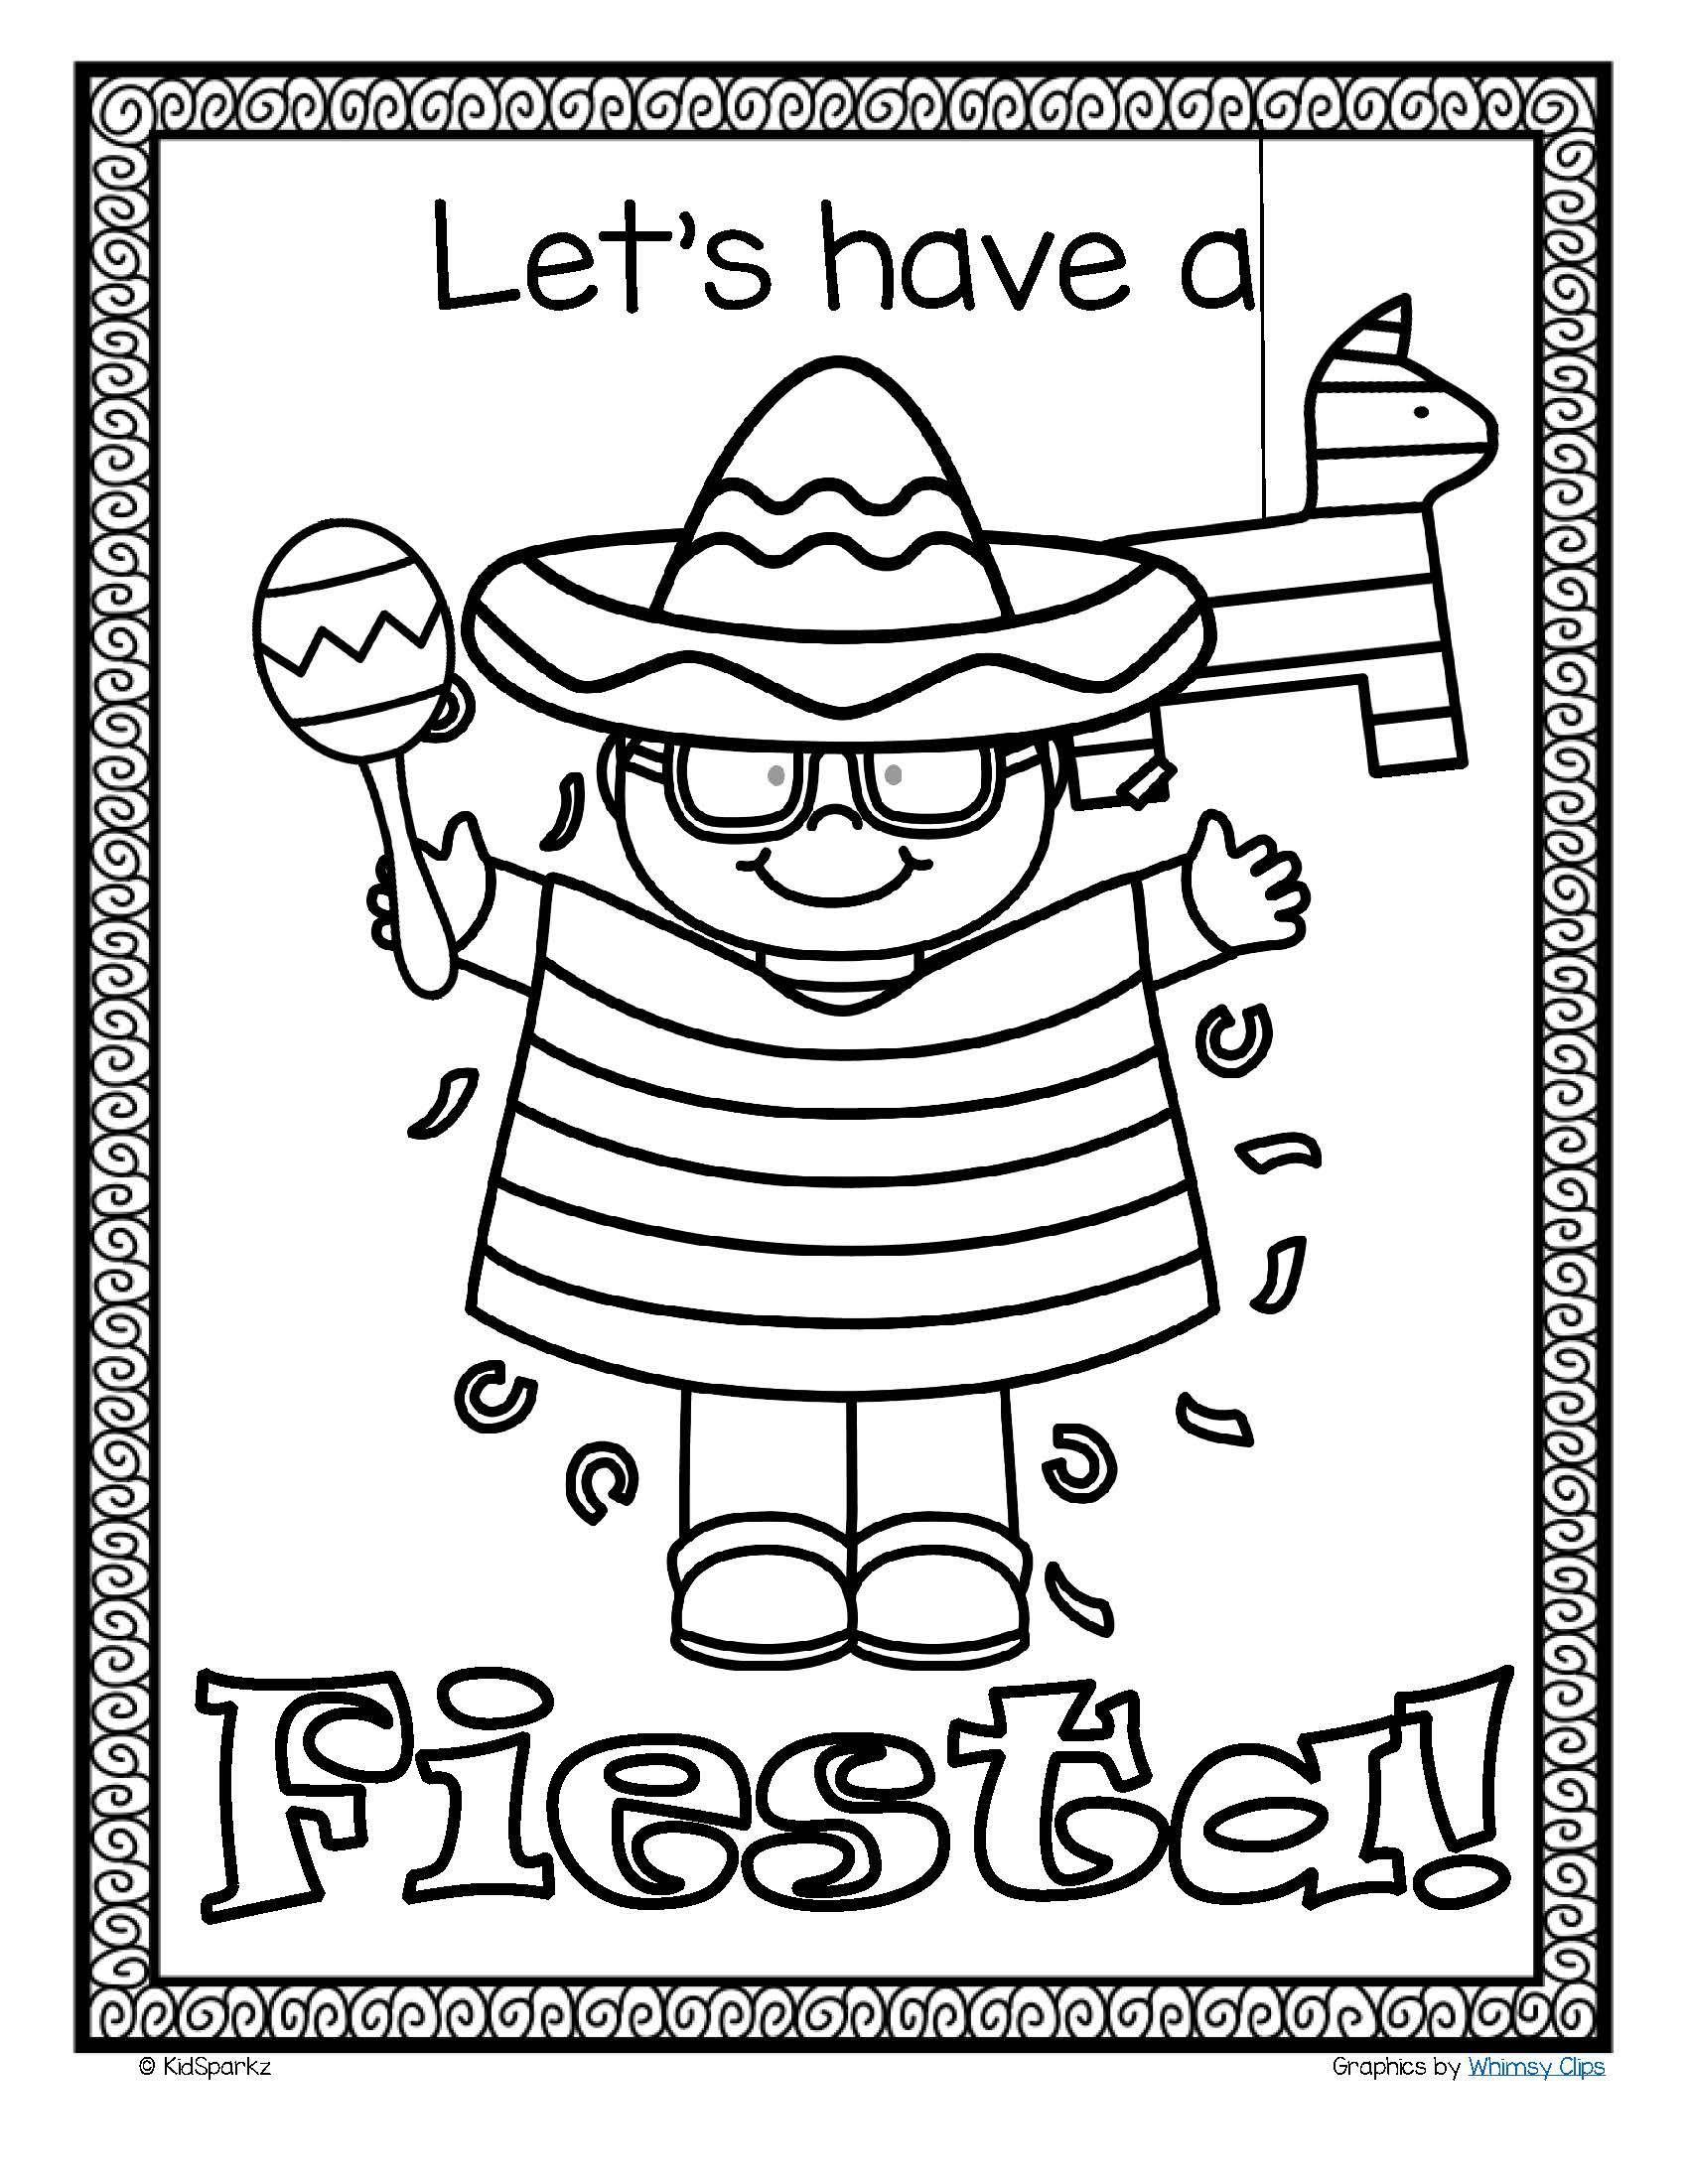 Free Cinco De Mayo Or Fiesta Poster In B W In